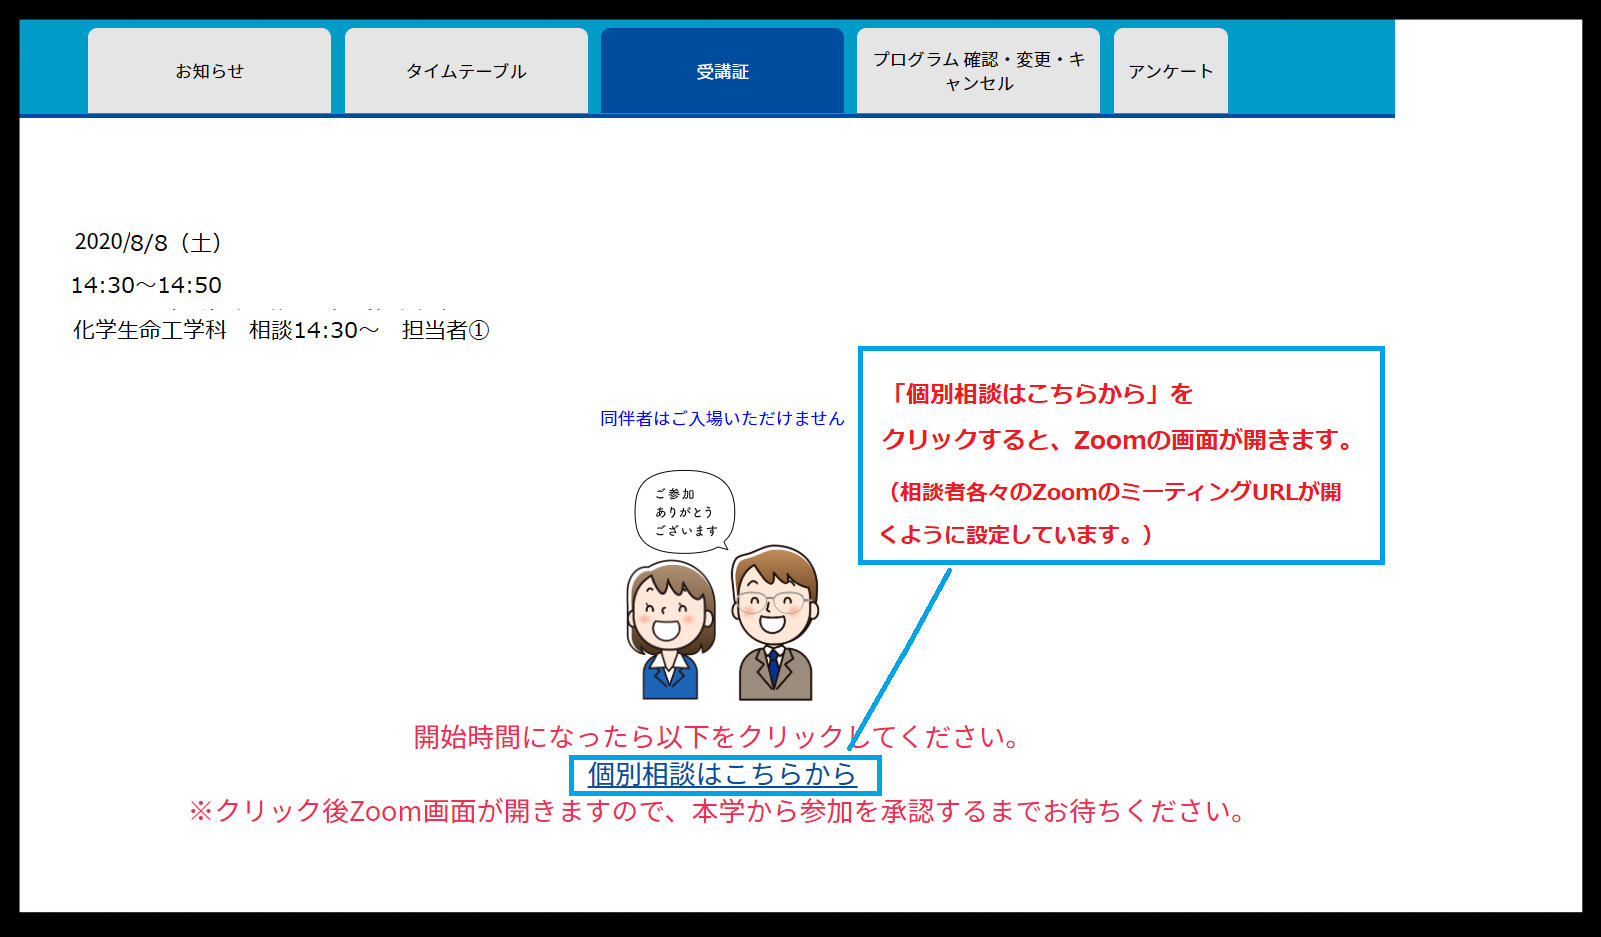 https://www.kindai.ac.jp/engineering/news/topics/_upload/jukousyou-4.jpg